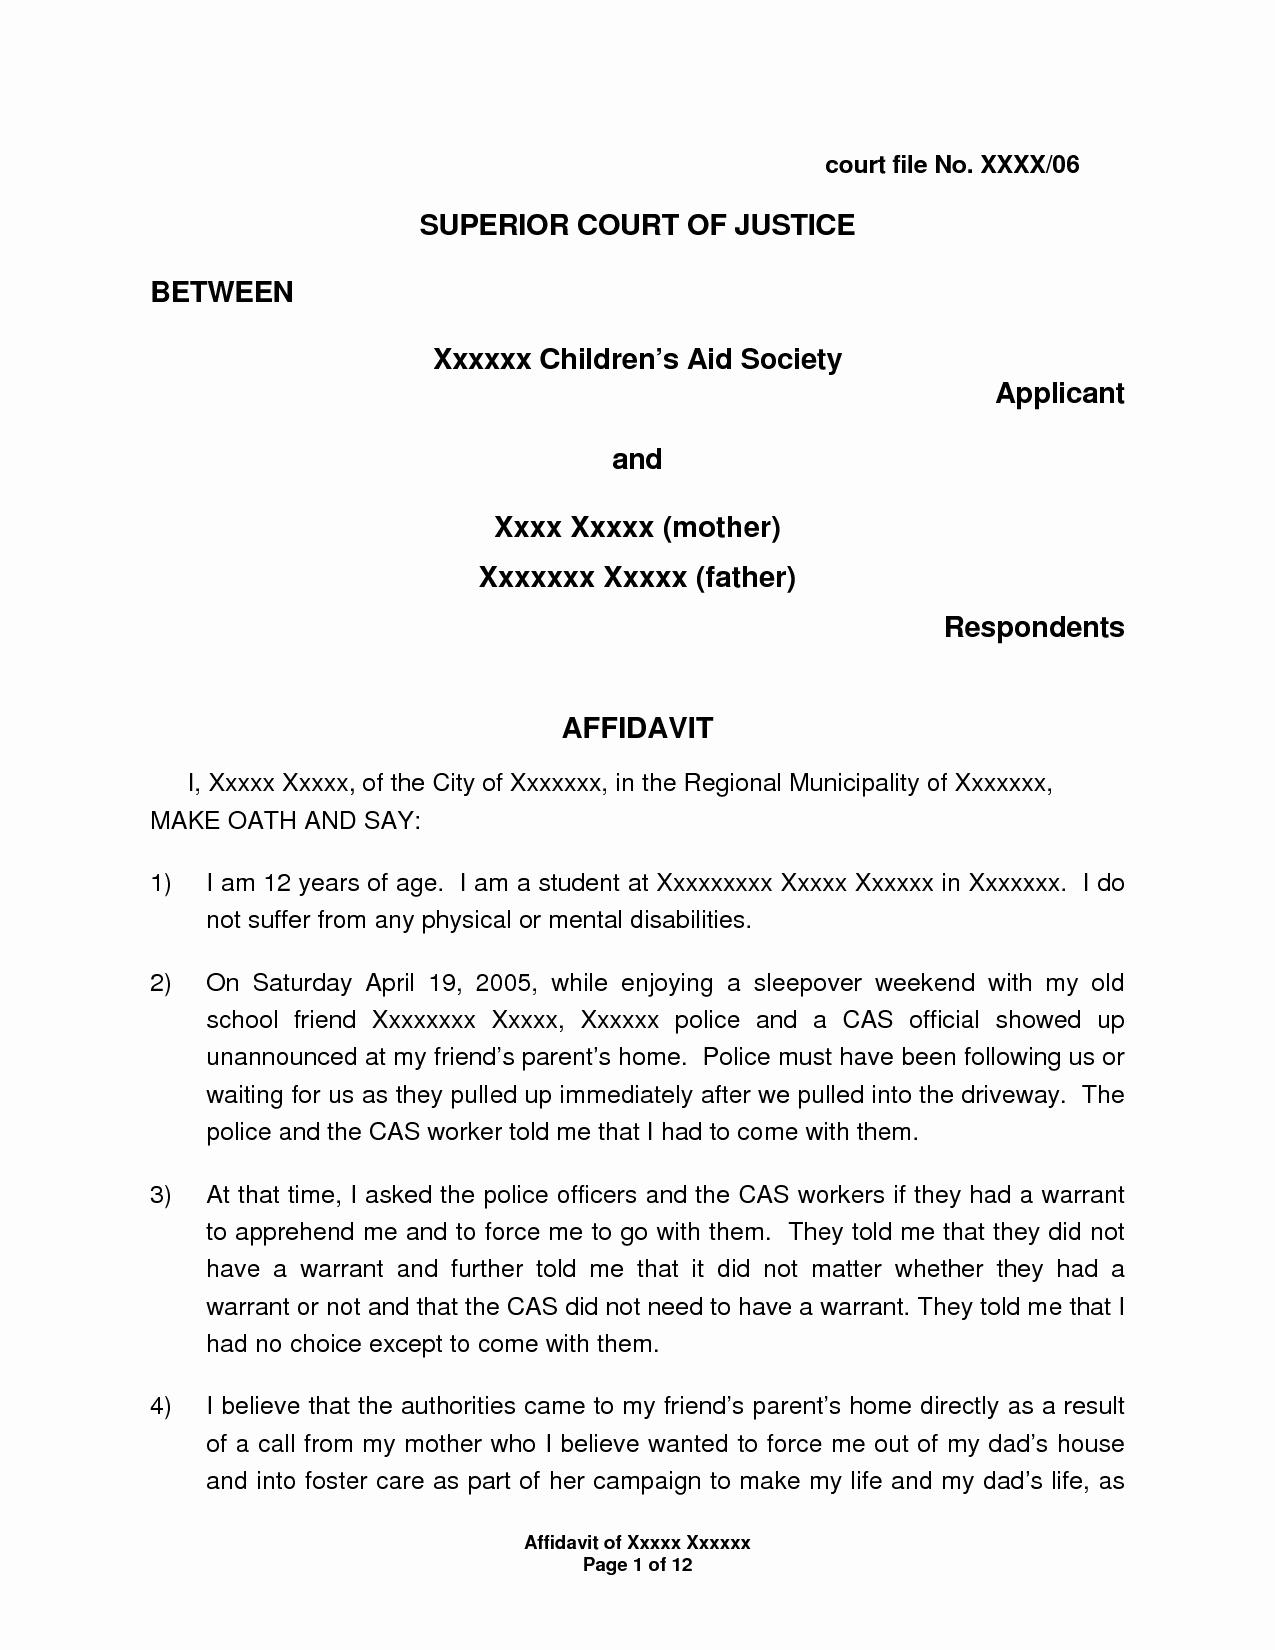 Proof Of Marriage Letter for Immigration Lovely Affidavit Letter Template I 751 Sample Ba Ymyku Sworn